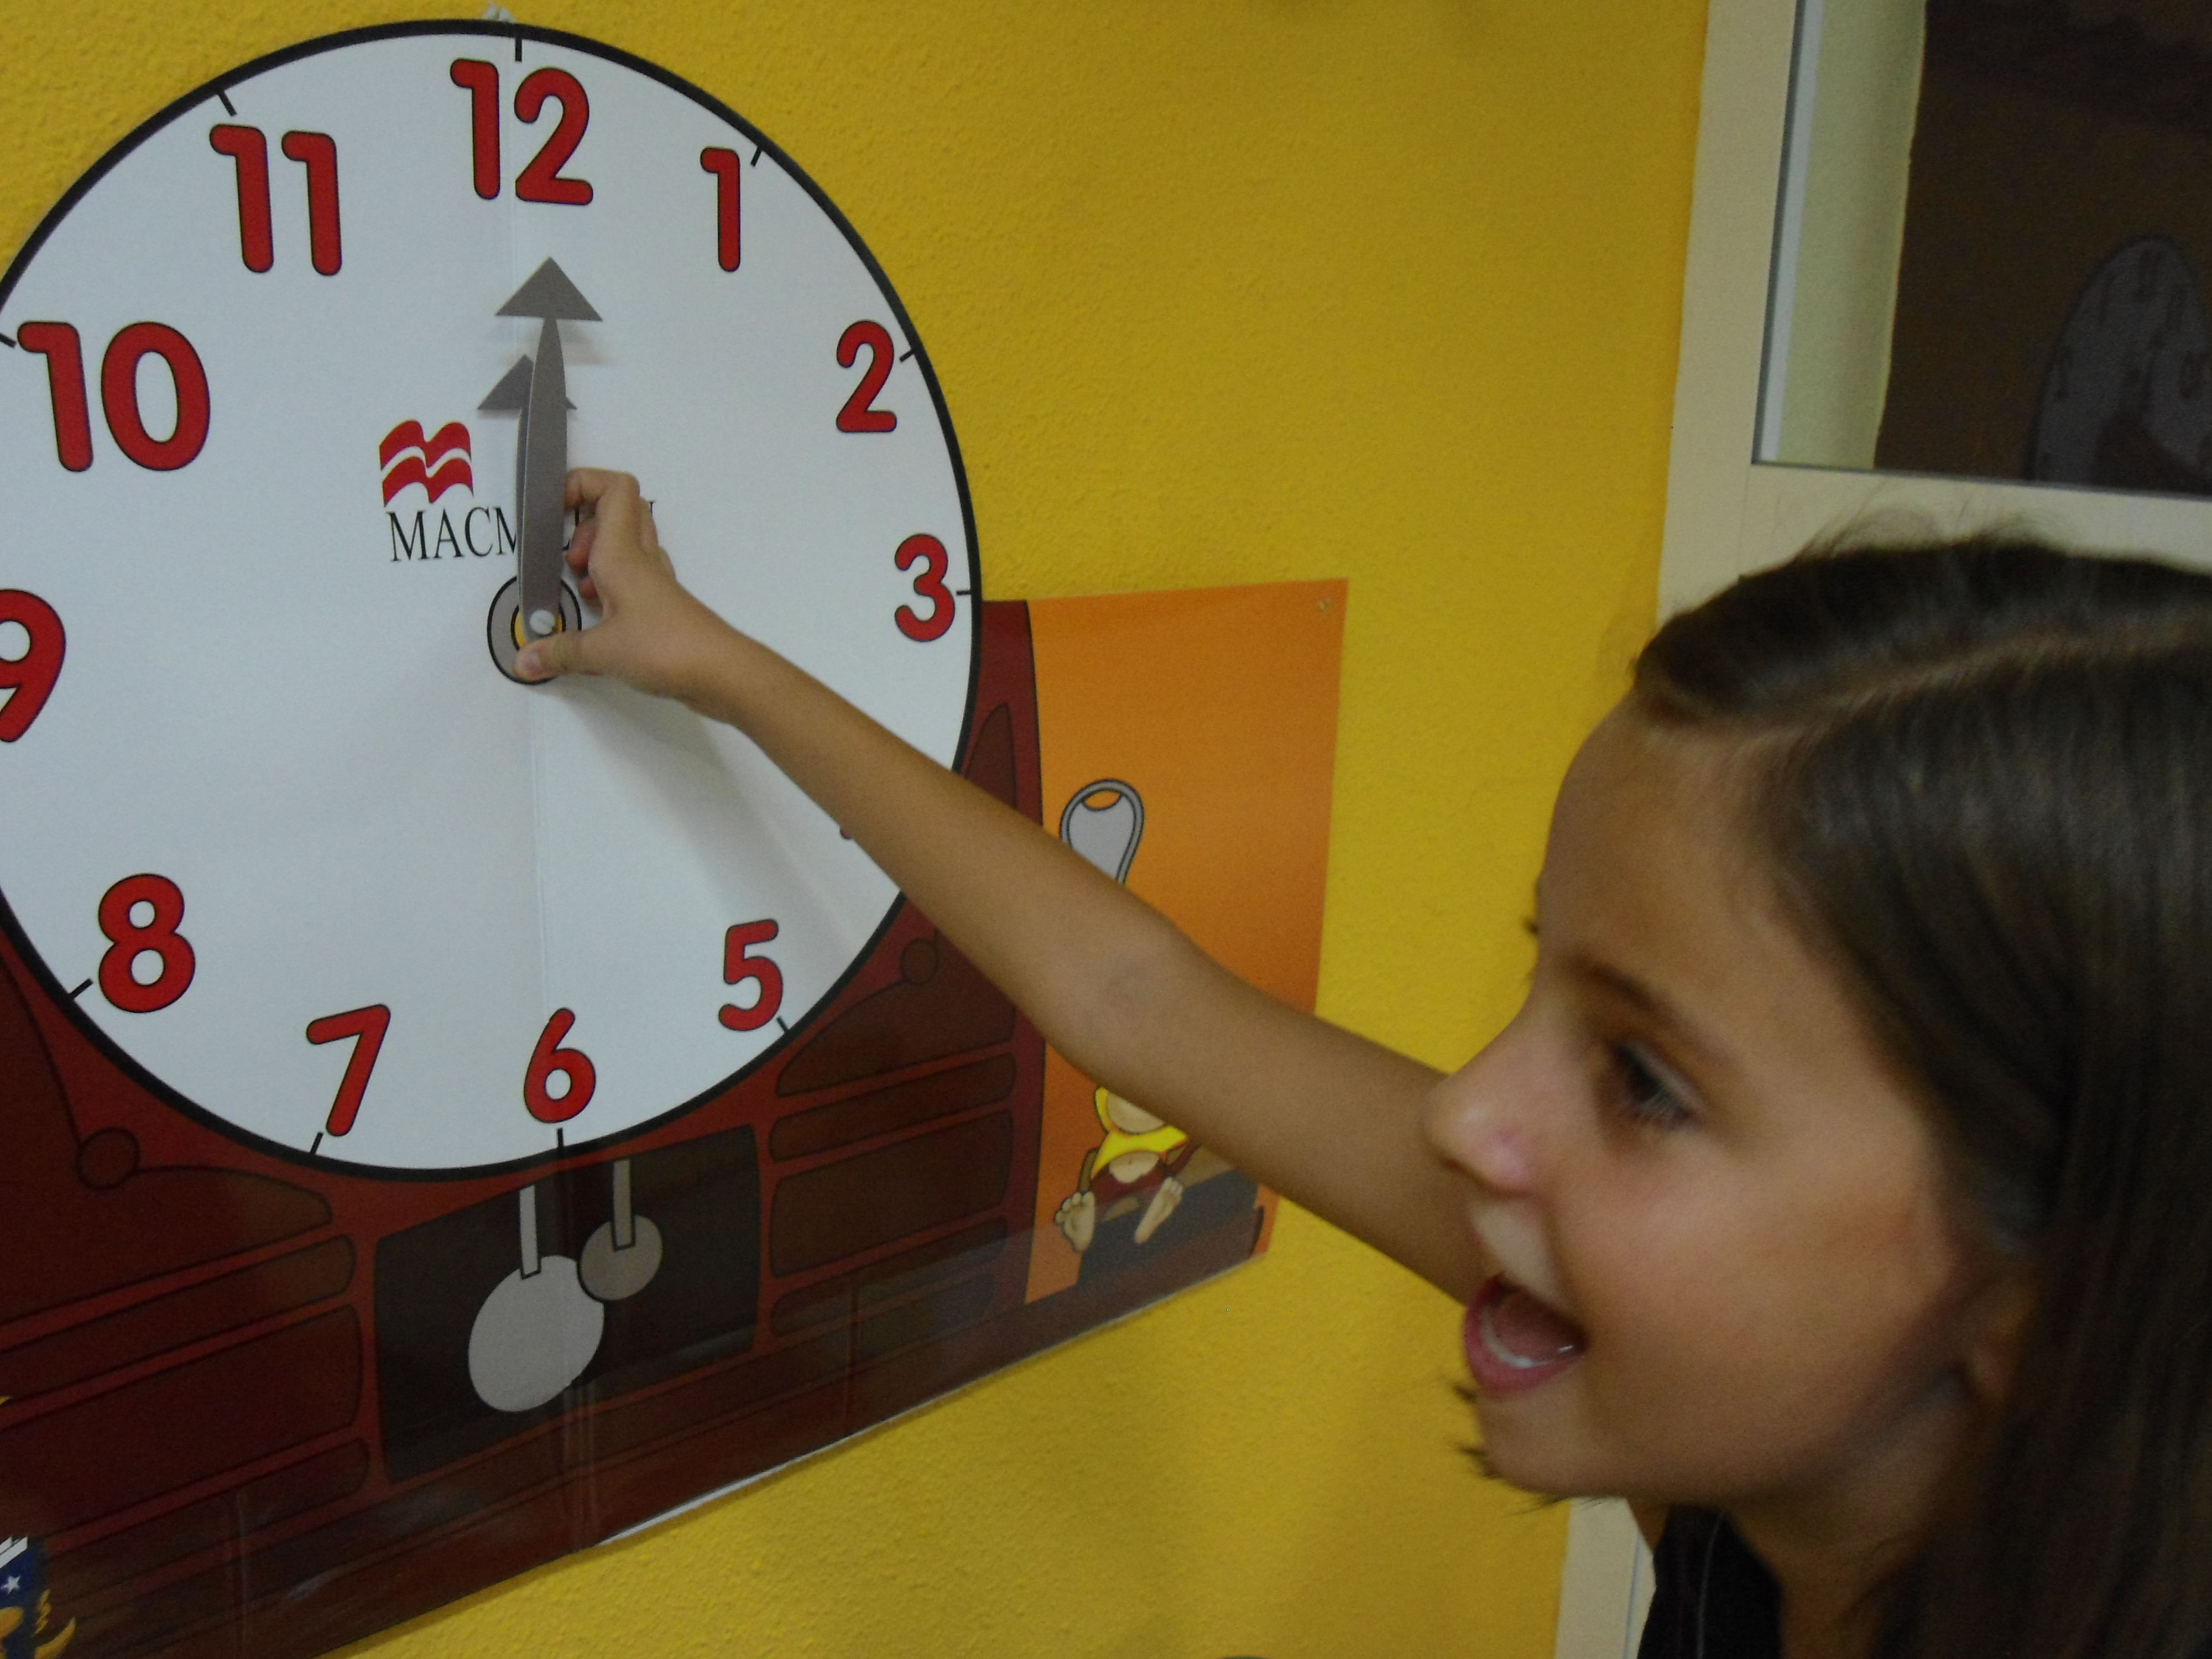 Foto 23 de Academias de idiomas en Moncada | Centre d'Estudis Etnies